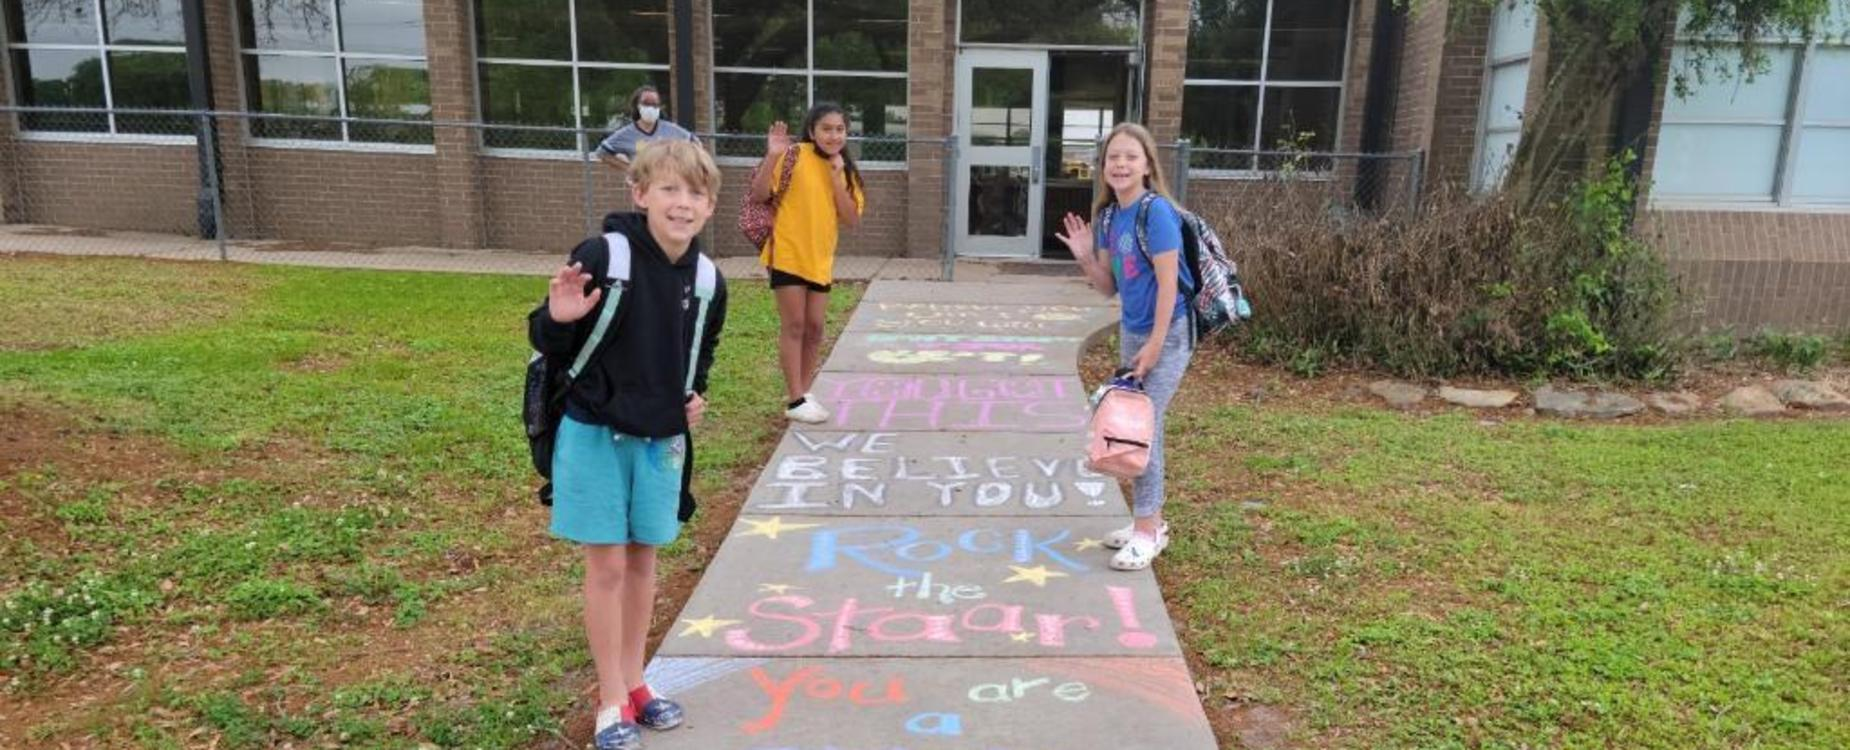 students on a chalk decorated sidewalk